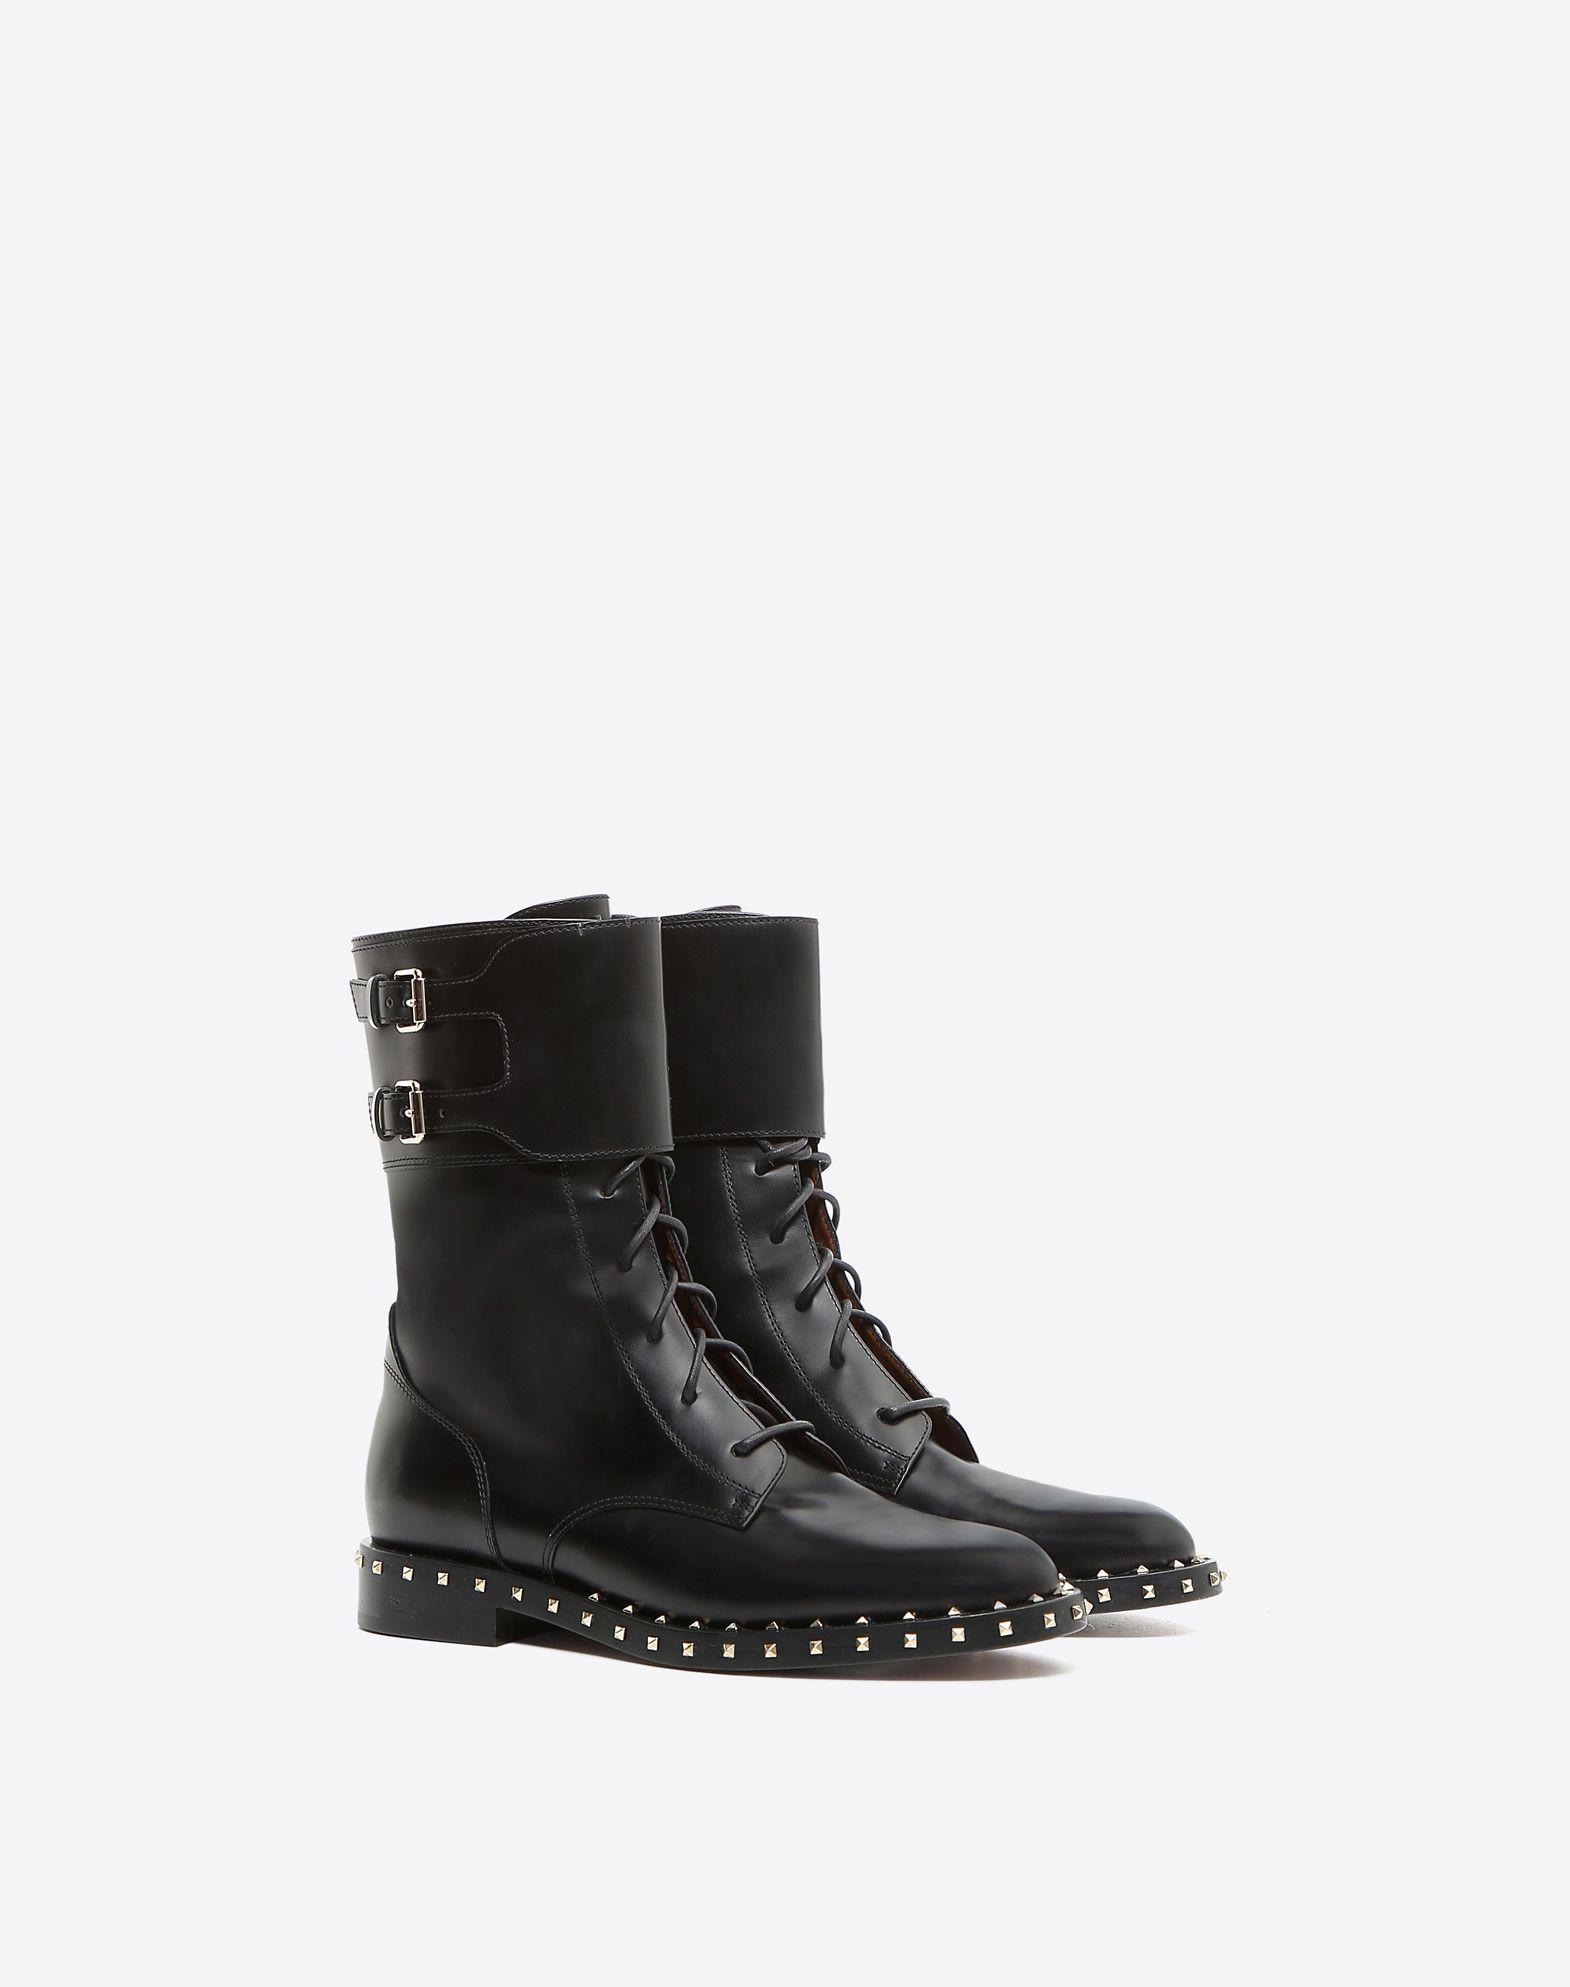 Valentino Garavani Soul Rockstud boots Bdpx0l6lNO